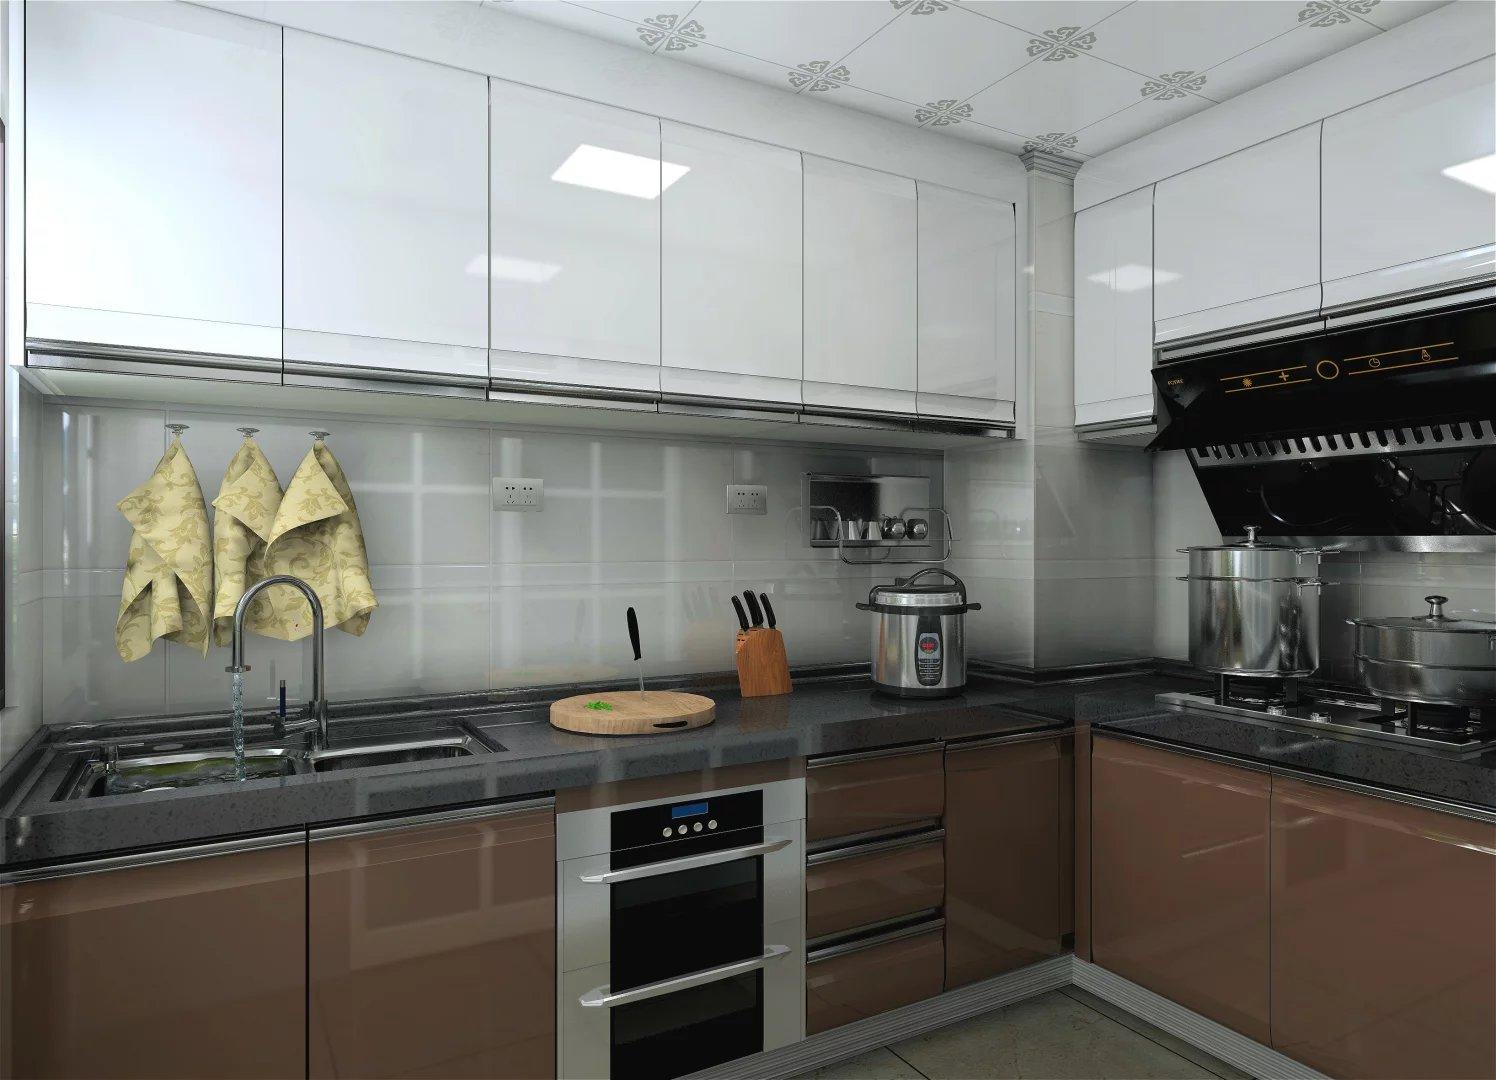 Kerala precio negro superficie s lida cocina home depot for Superficie cocina